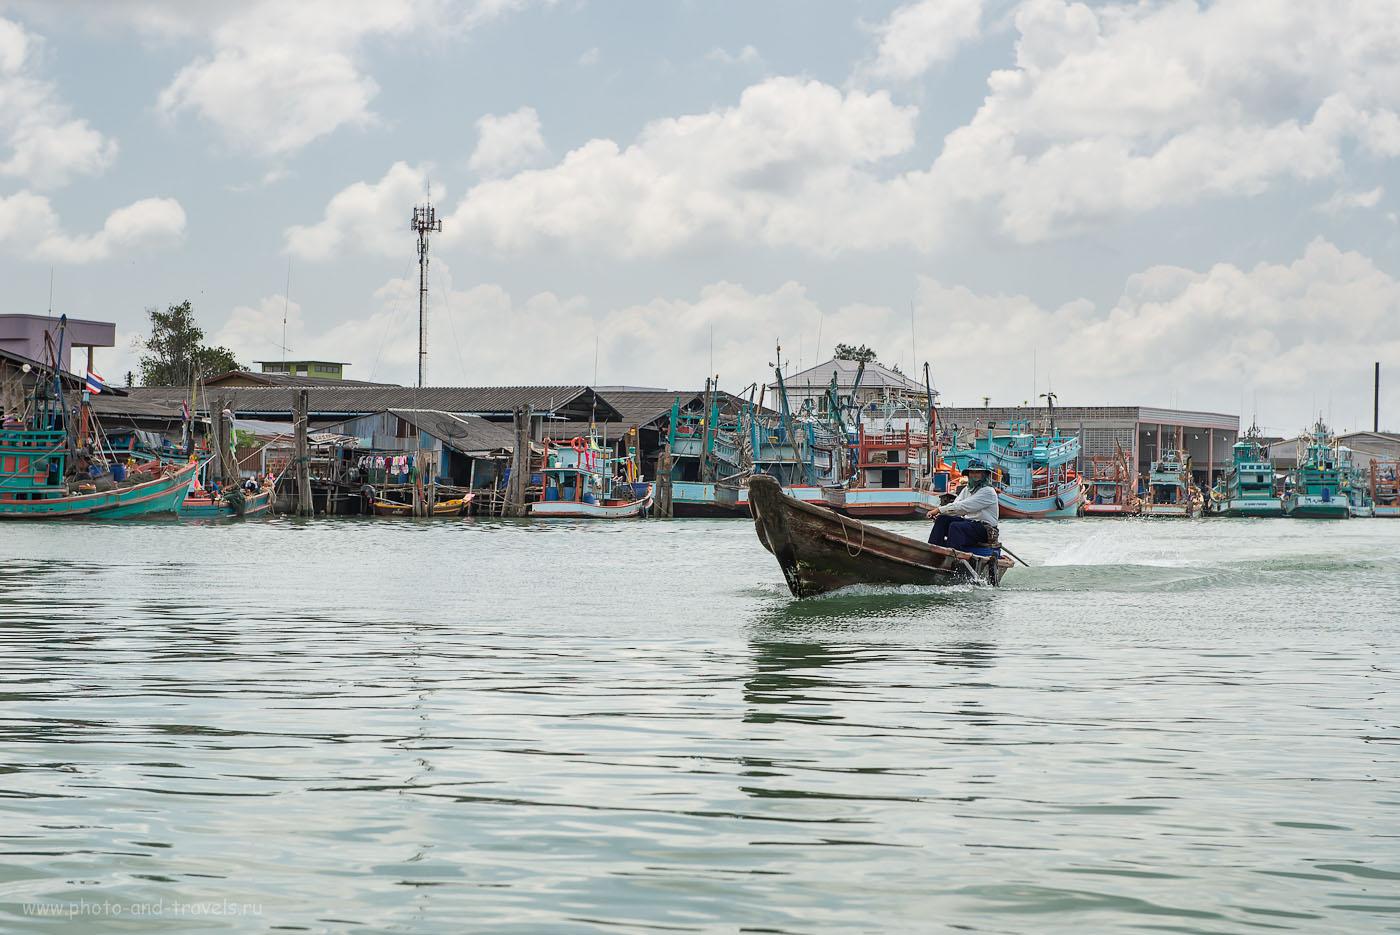 Фотография 22. На реке Tha Taphap в Таиланде (320, 70, 8.0, 1/500)